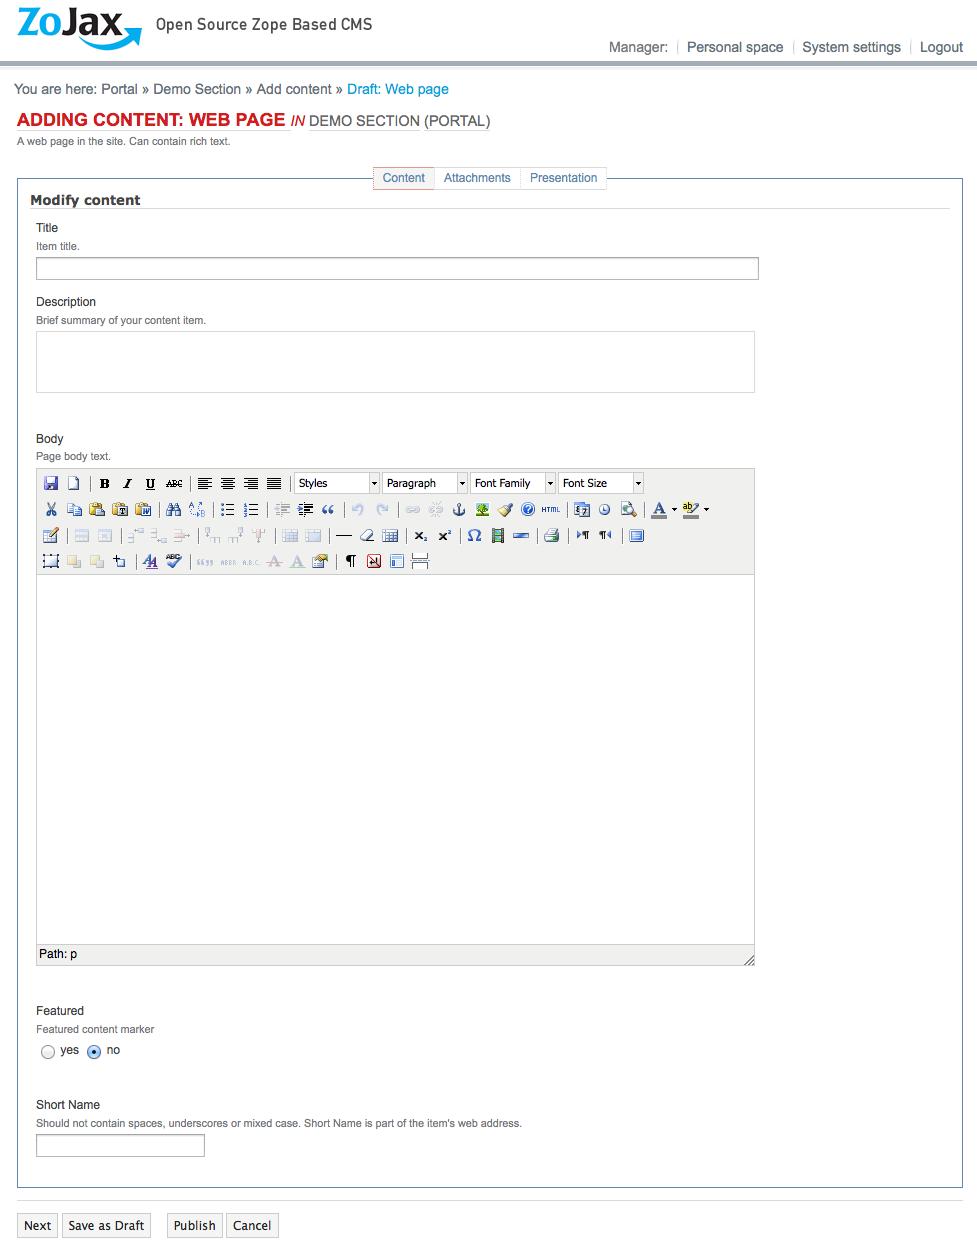 Add/edit a web-page form